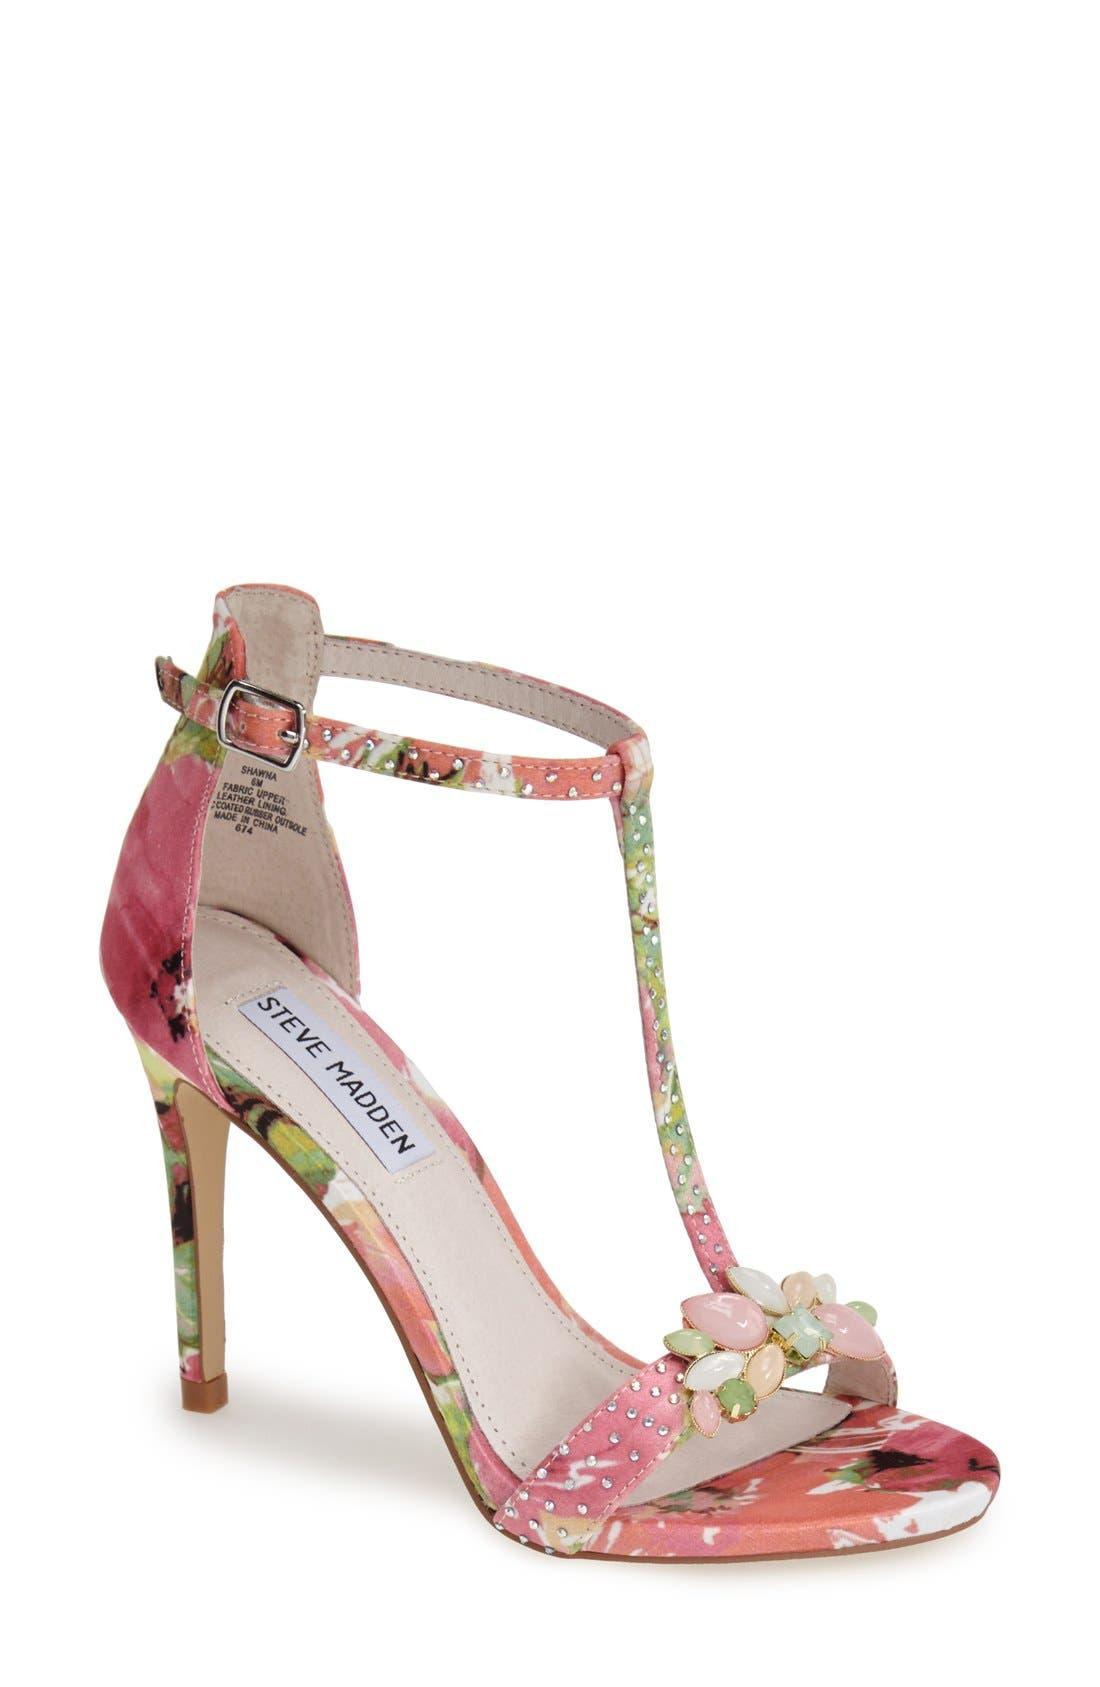 Main Image - Steve Madden 'Shawna' Embellished T-Strap Sandal (Women)